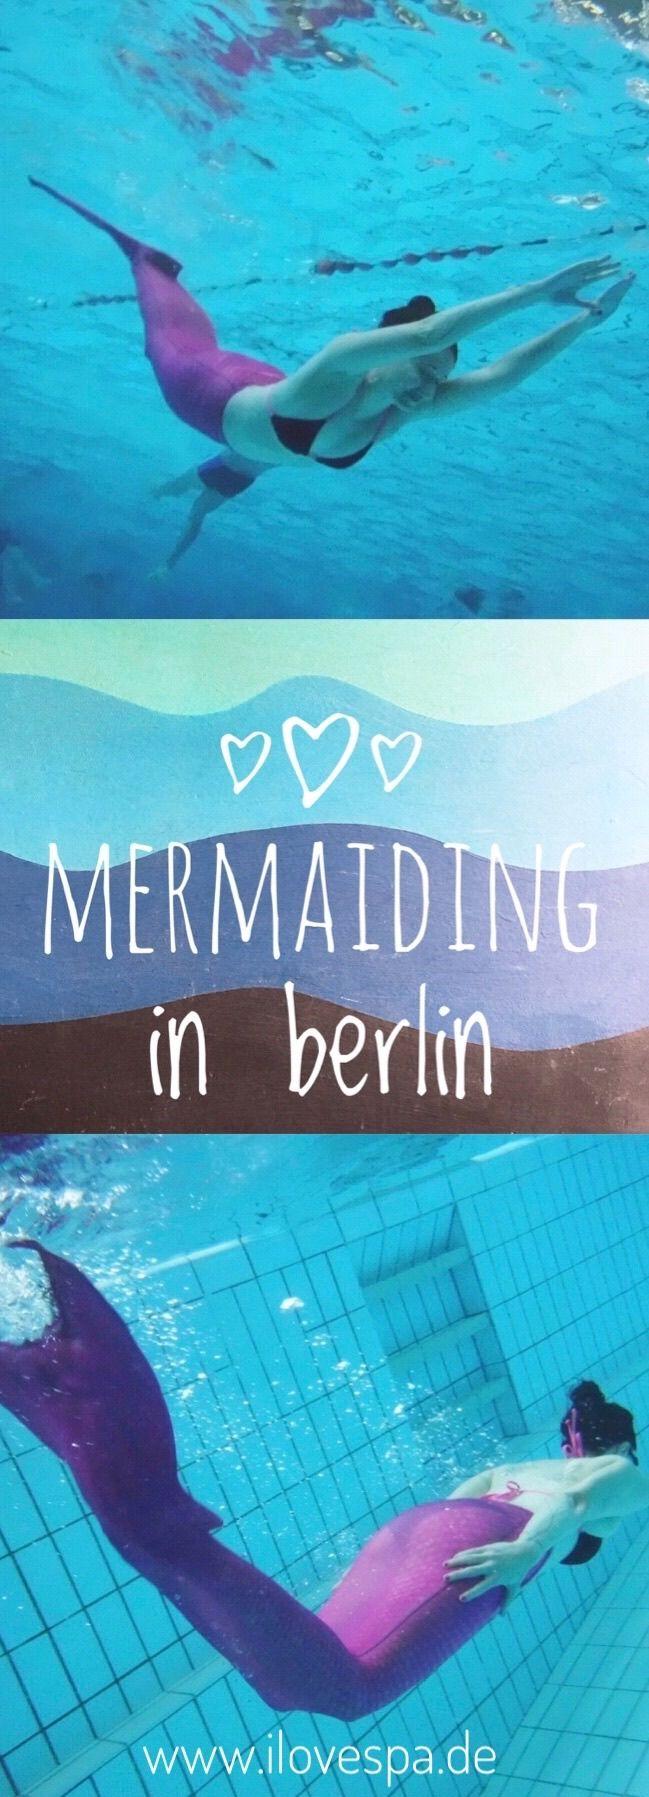 Meerjungfrauen Schwimmen in Berlin